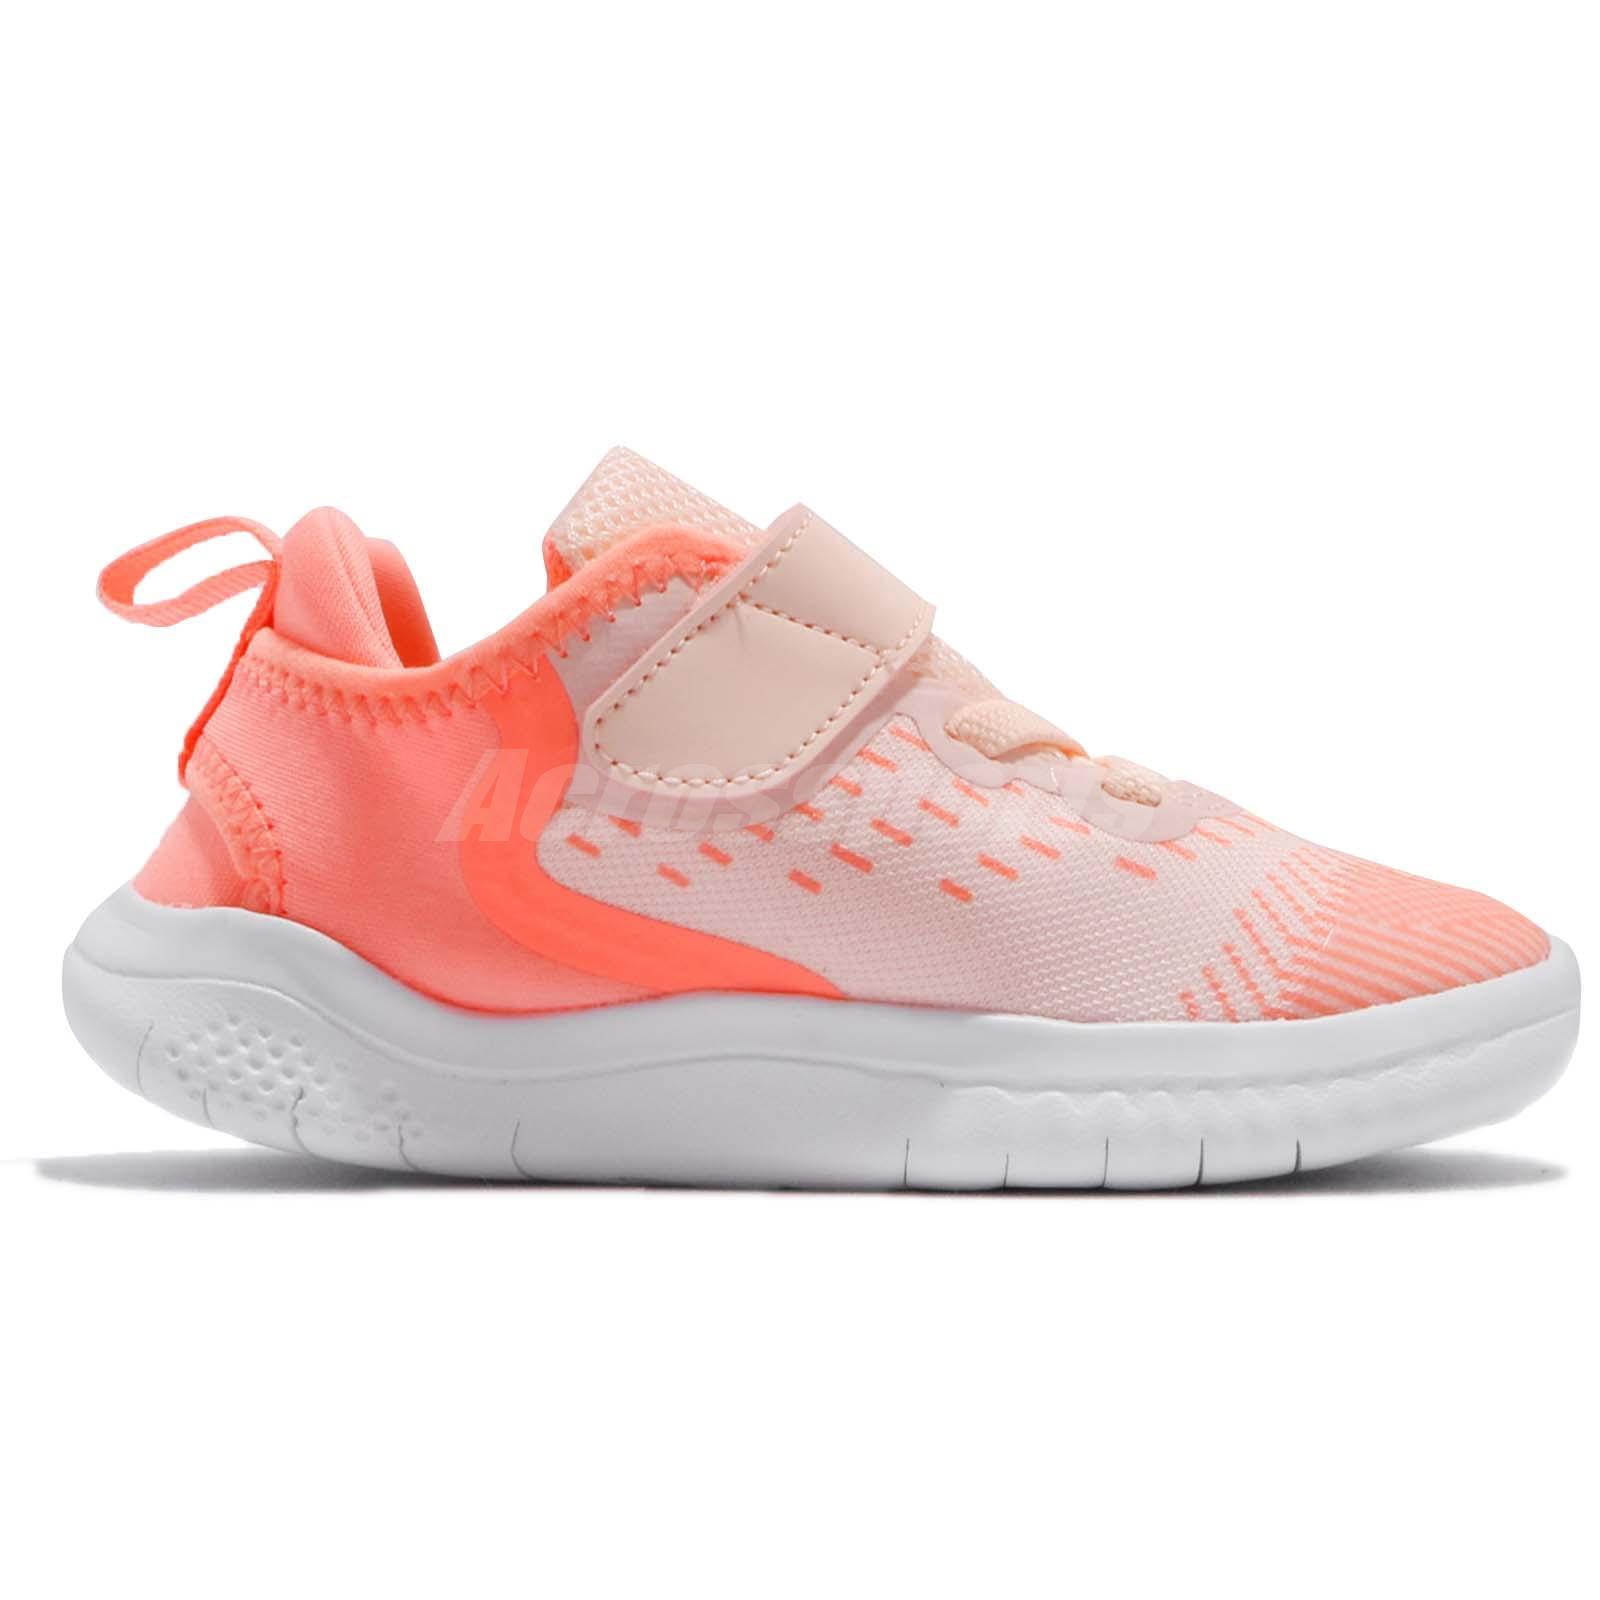 227c179ebeb45 Nike Free RN 2018 TDV Crimson Tint Toddler Infant Baby Shoes ...